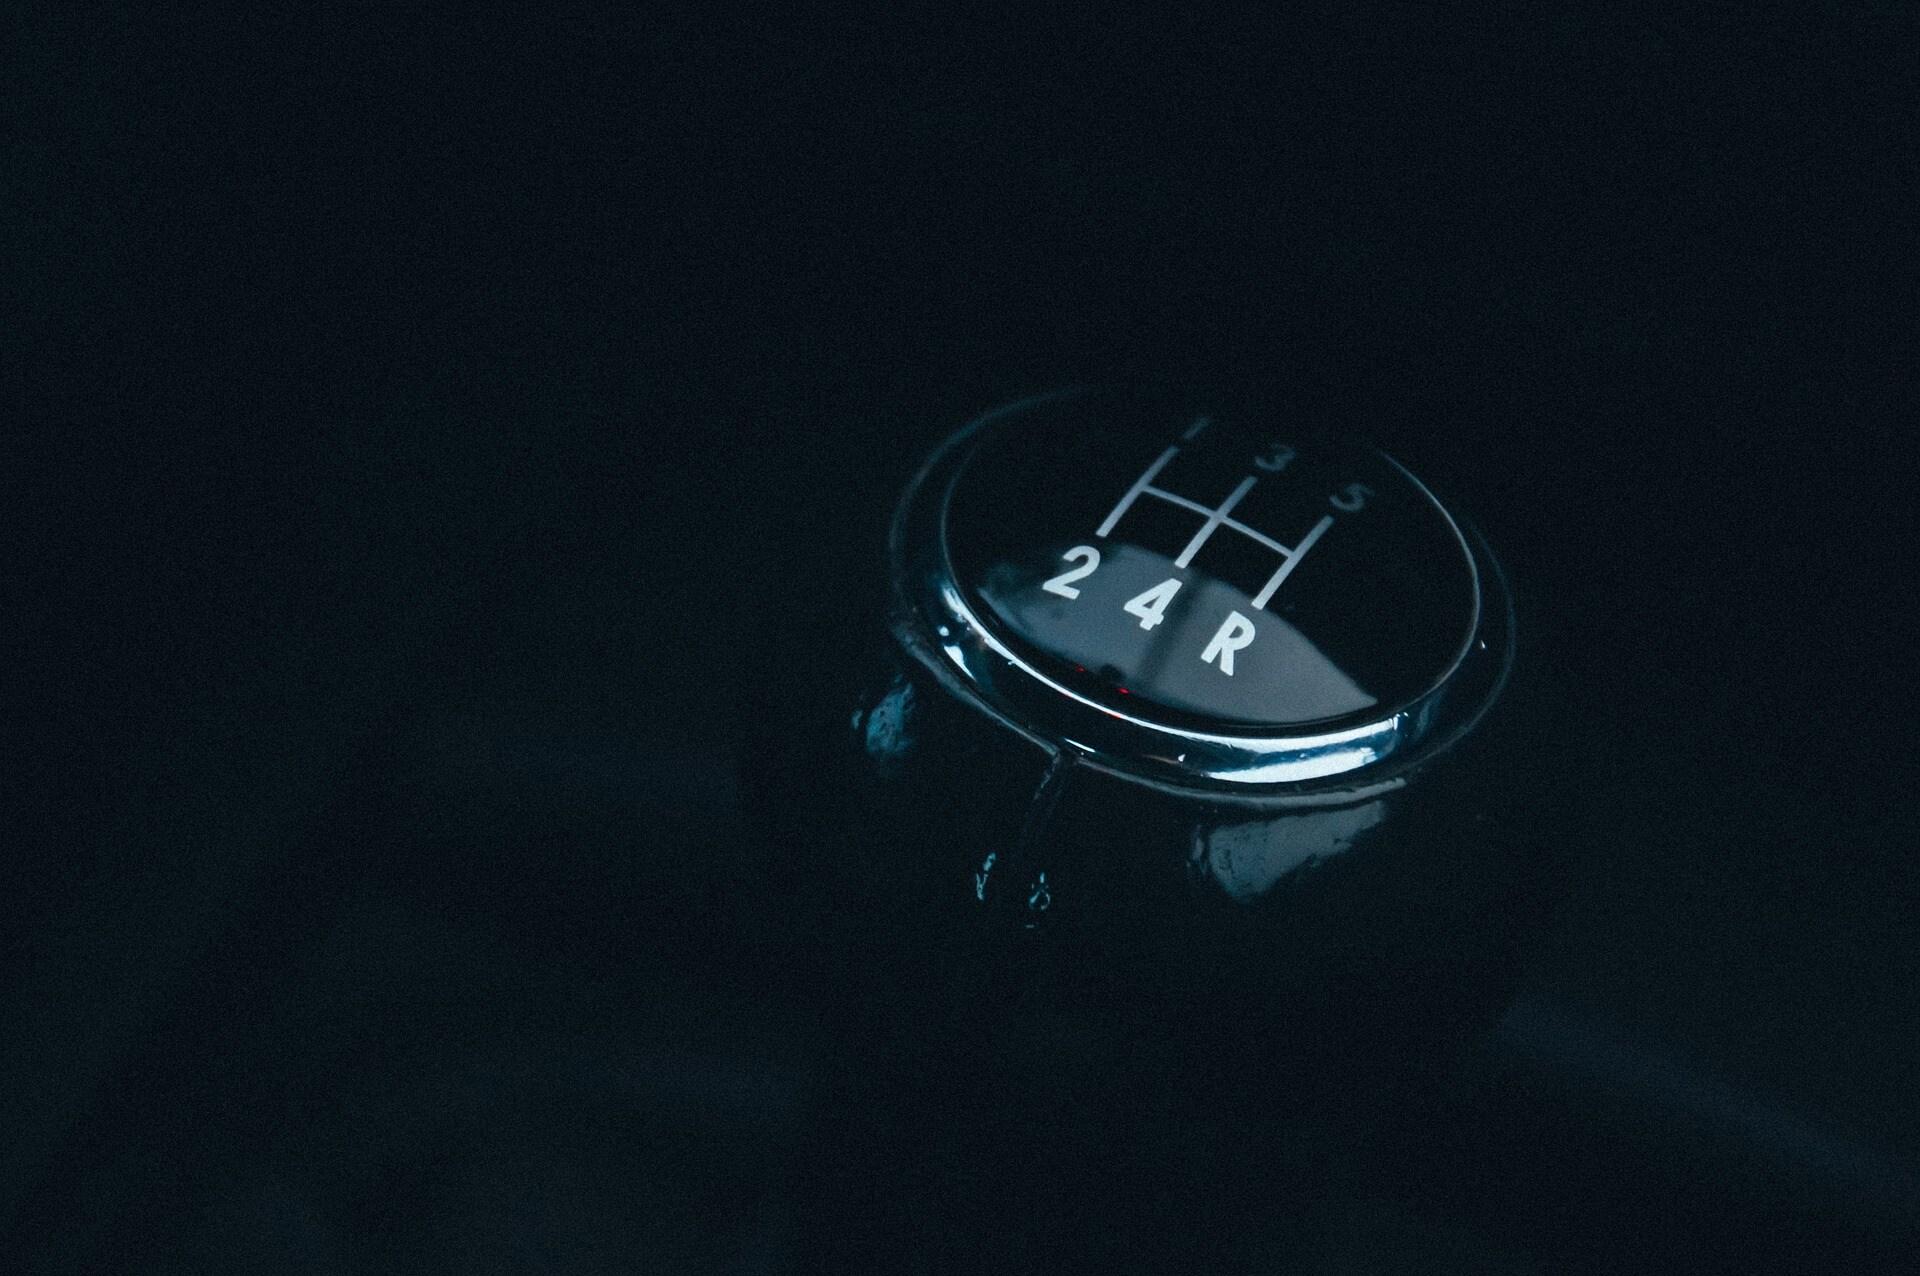 advantages of automatic manual transmission rh rosevillechryslerjeep net Automatic Transmission Manual Mode benefits of manual transmission vs automatic